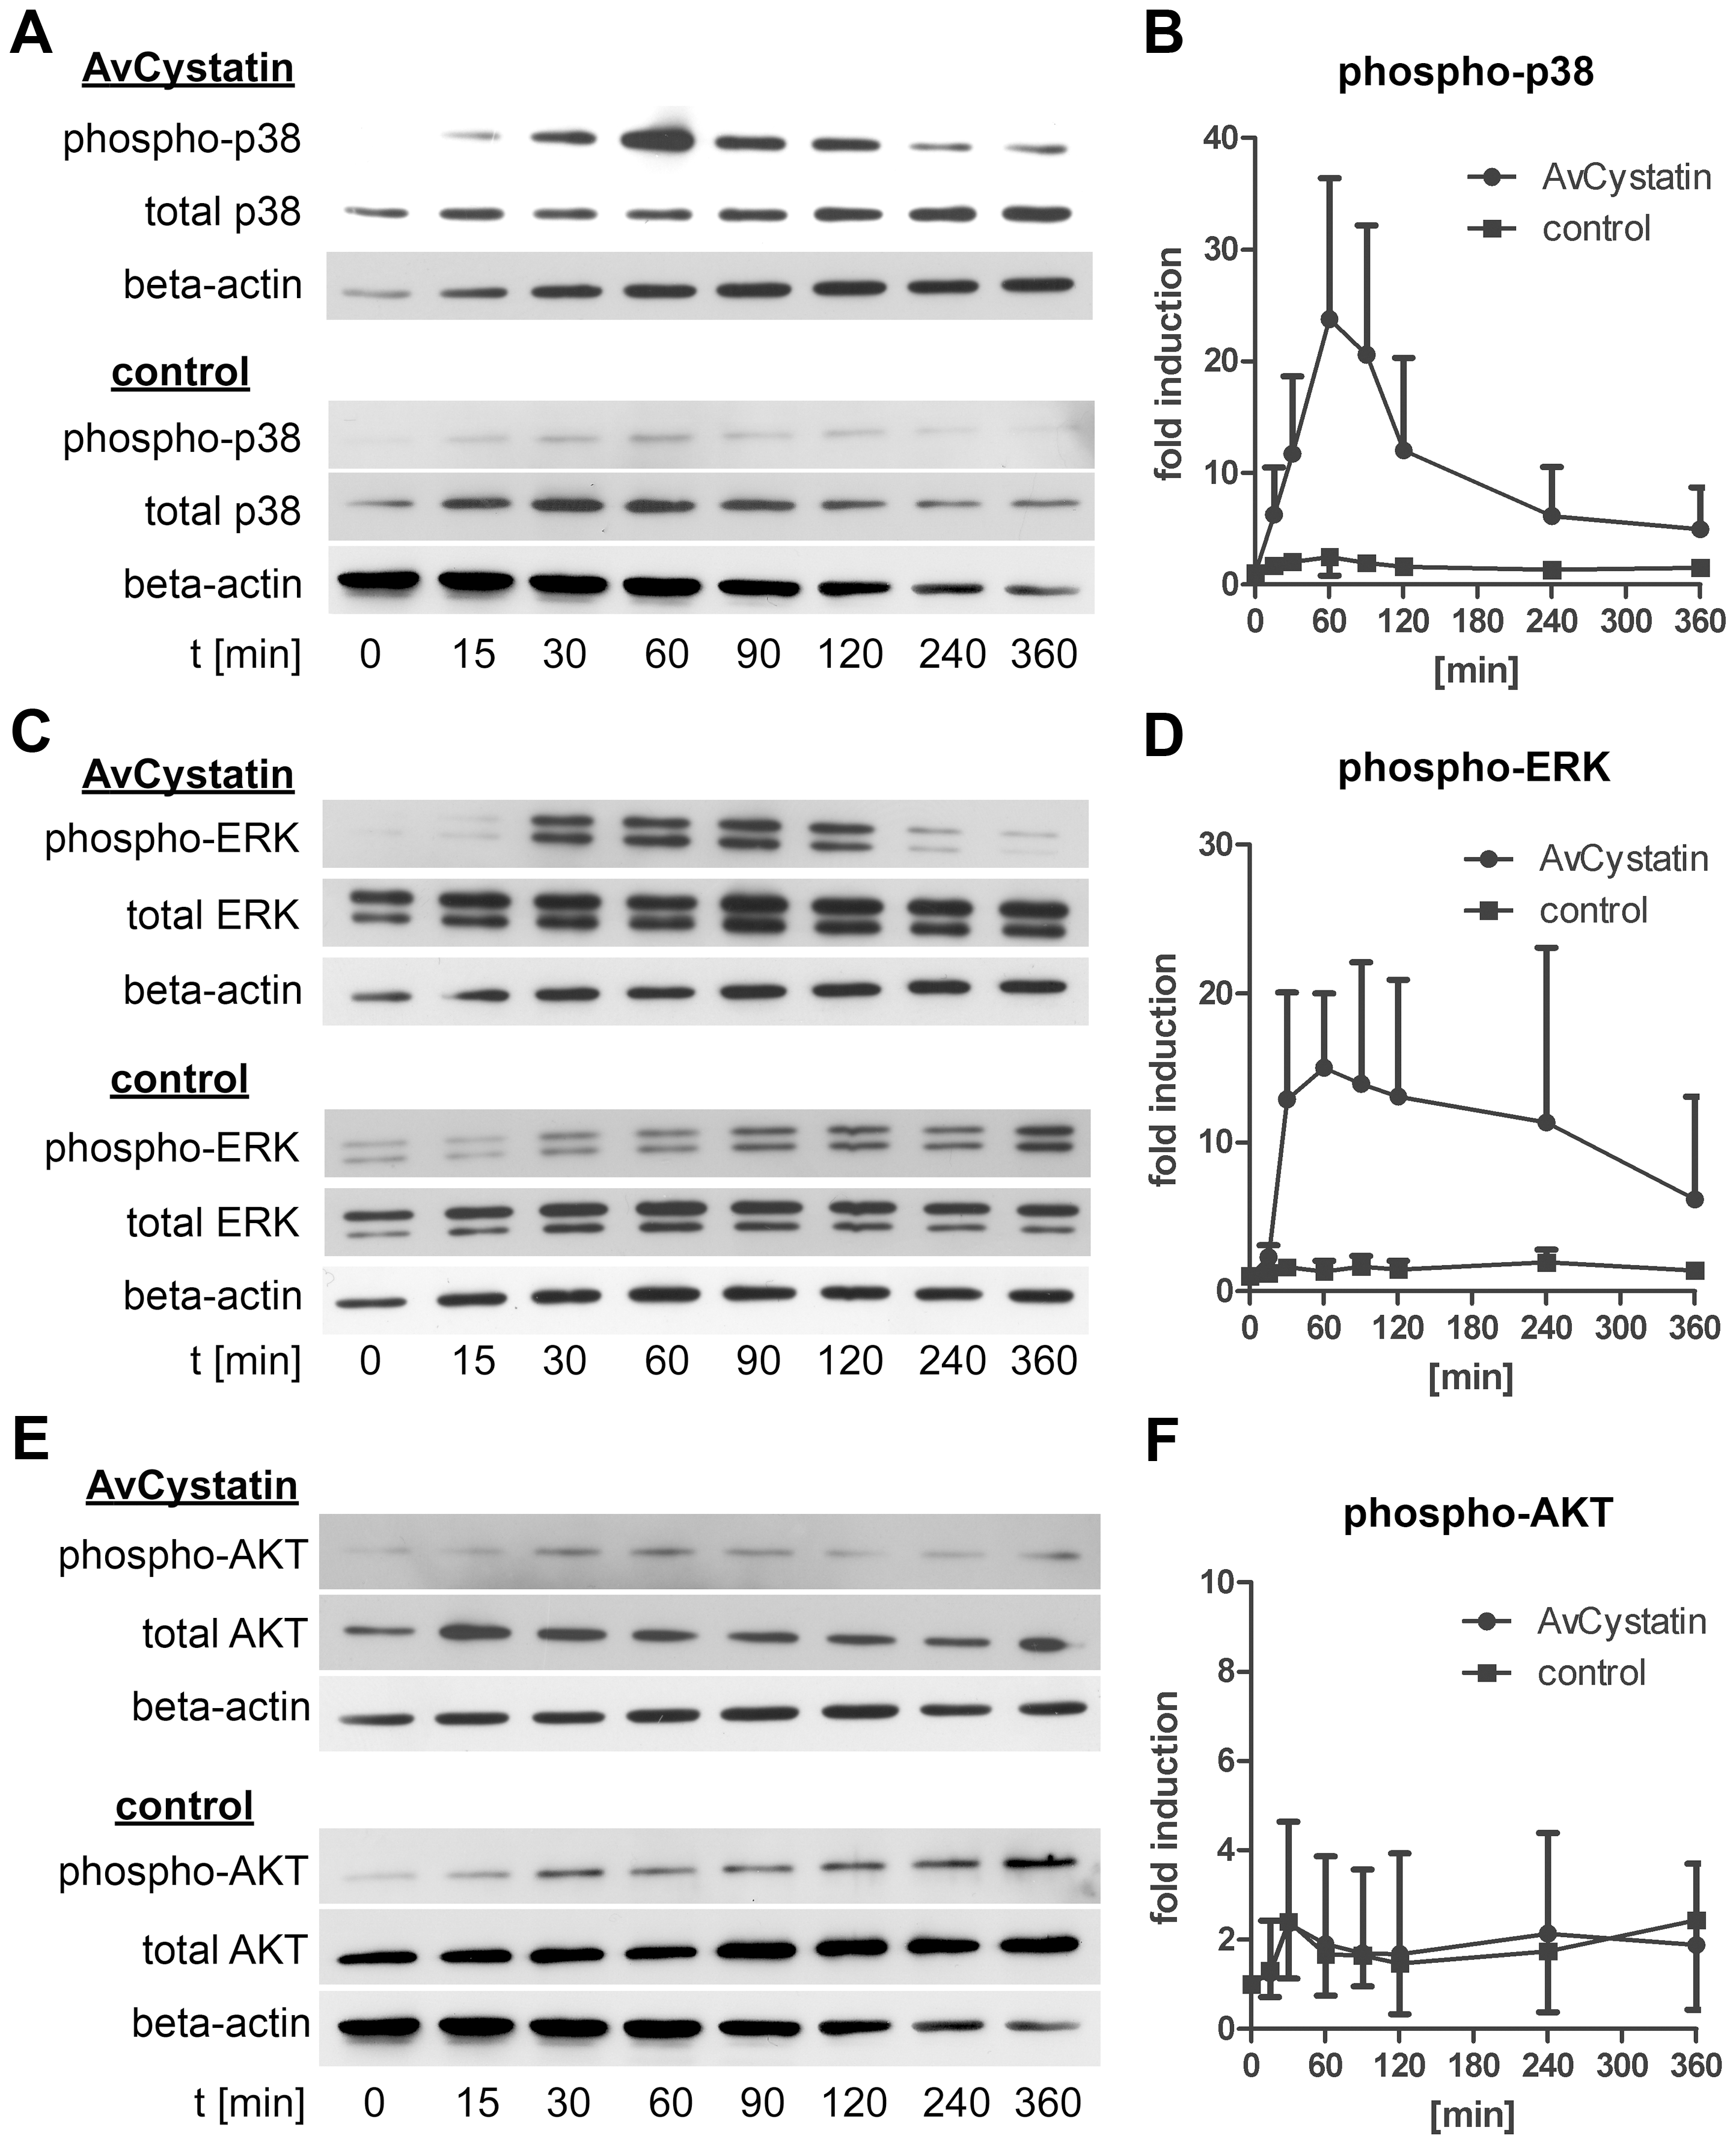 AvCystatin stimulation induces transient phosphorylation of p38 and ERK.